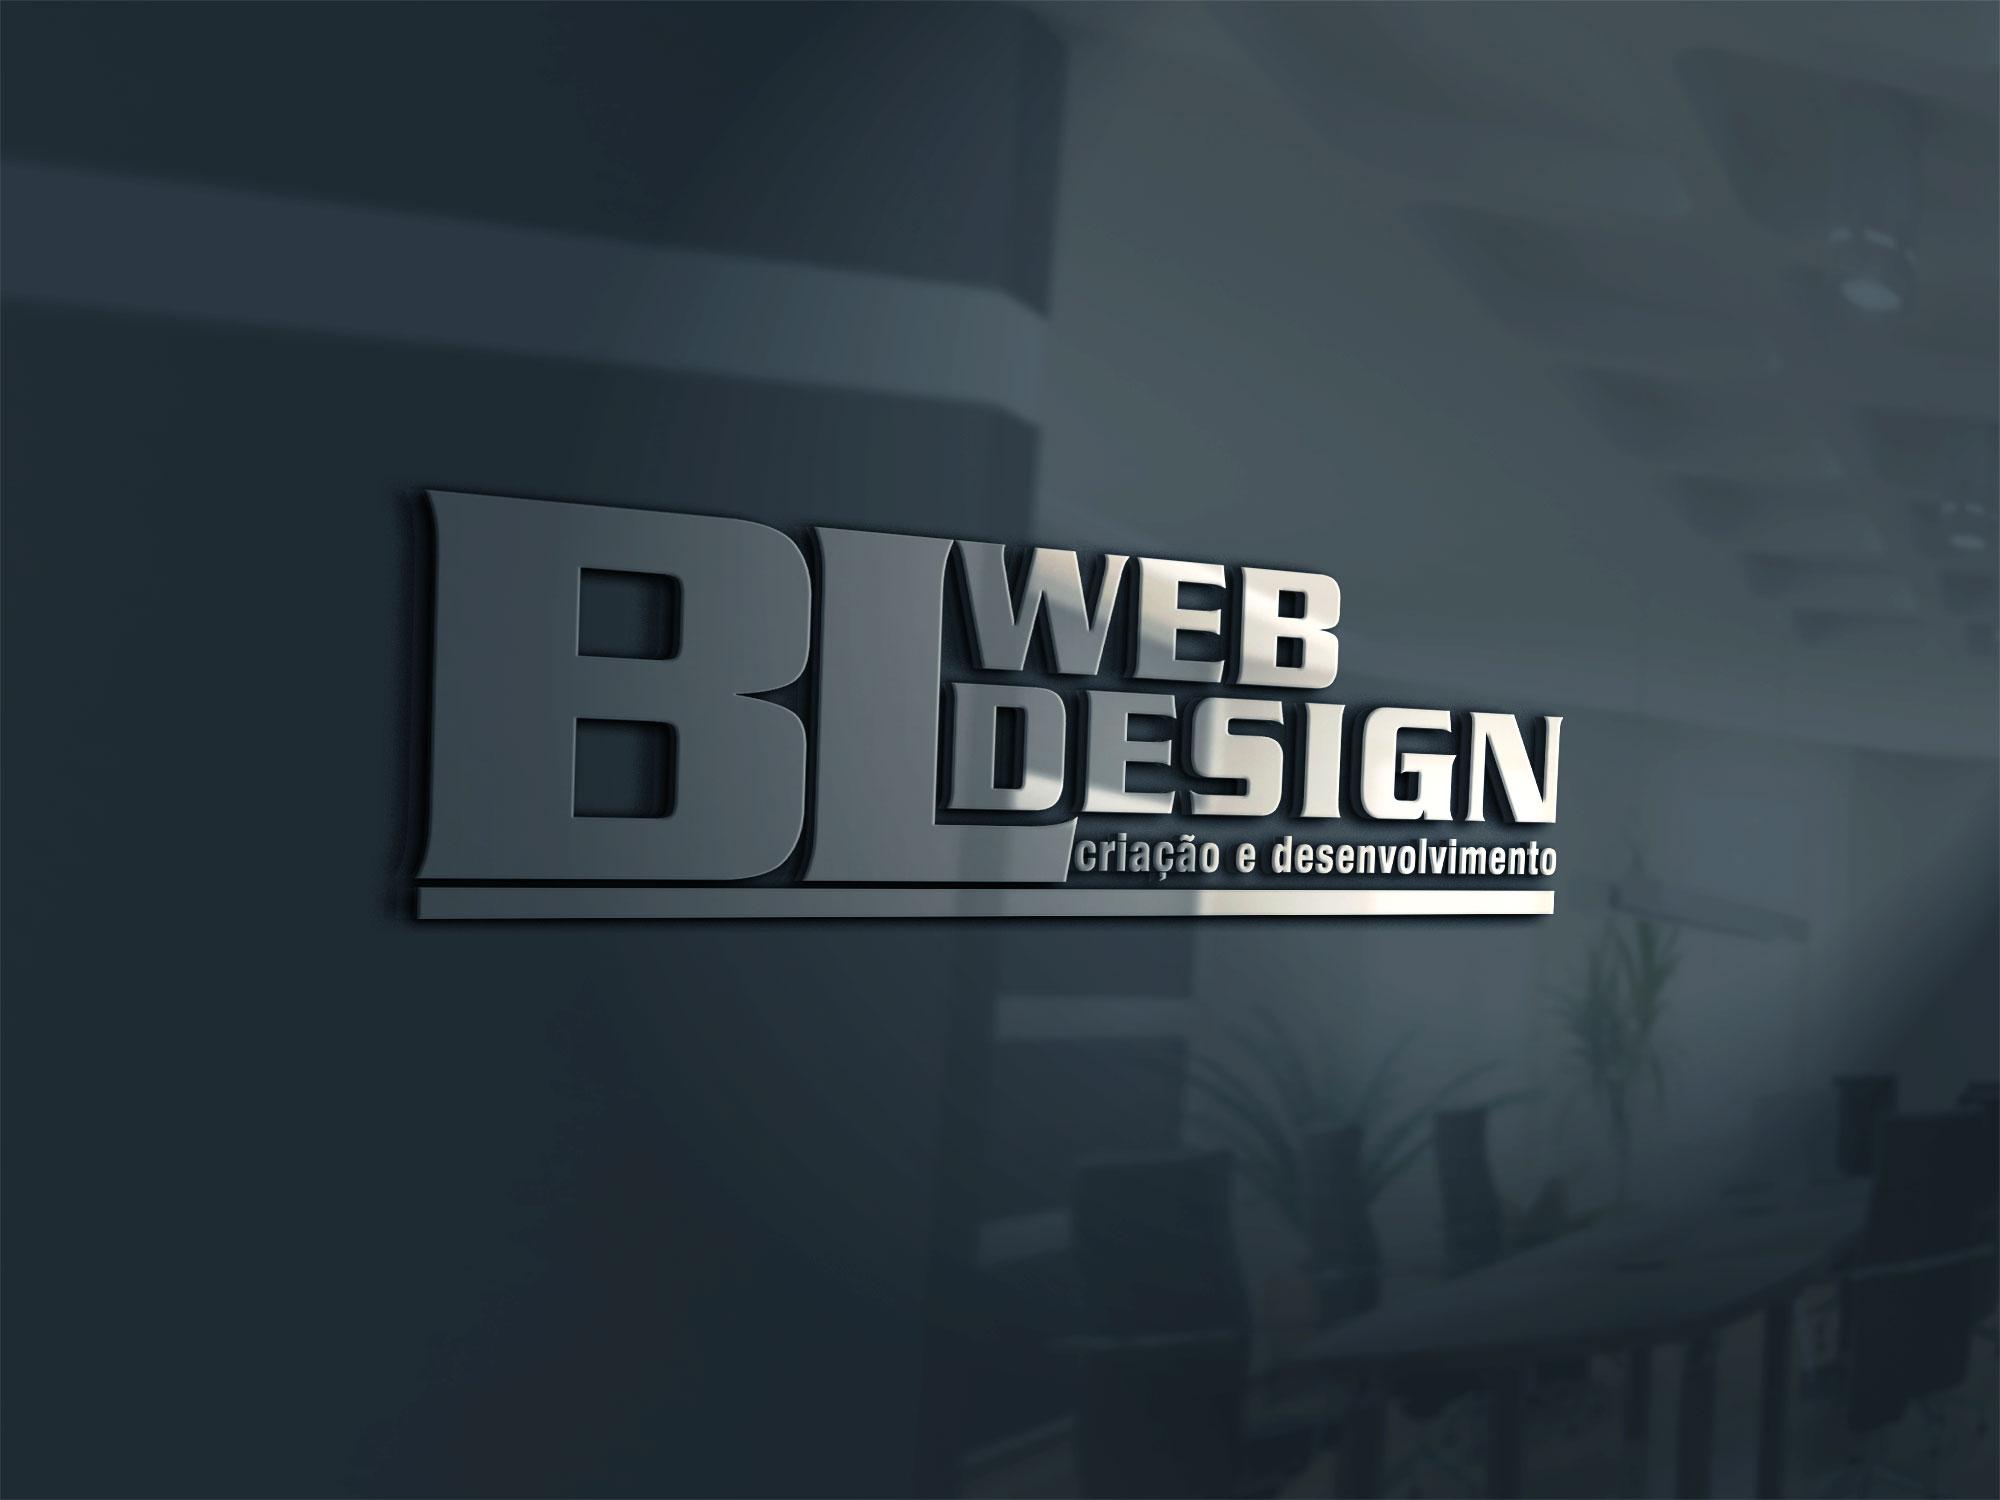 blwebdesign-2014-3